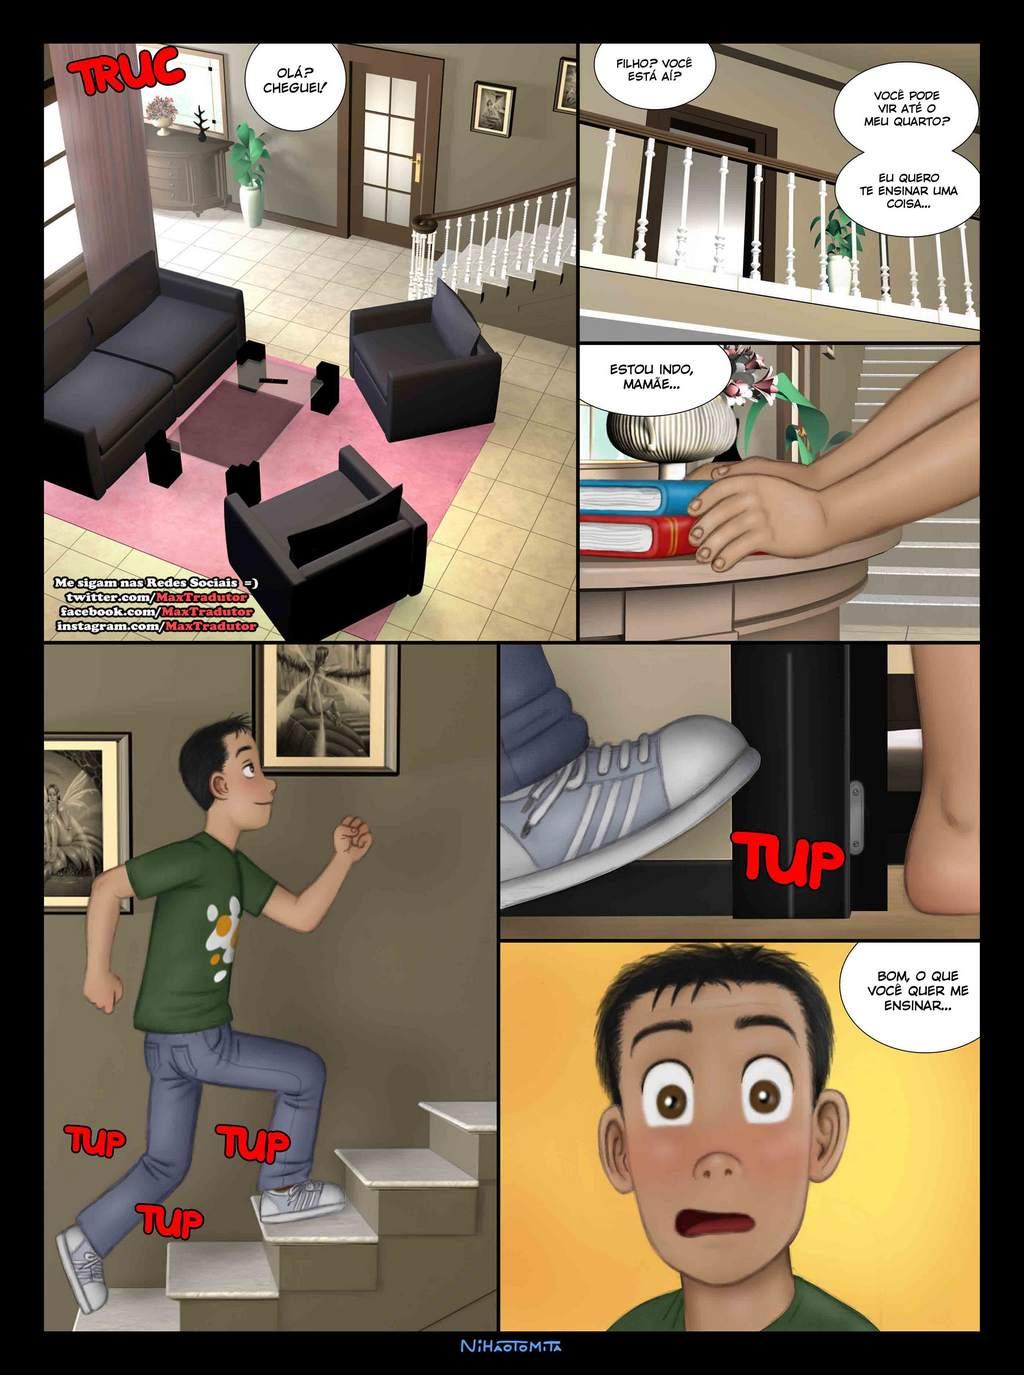 Where do Children Come From Nihaotomita Hentai Pag. 04 - hentai, comics-hq